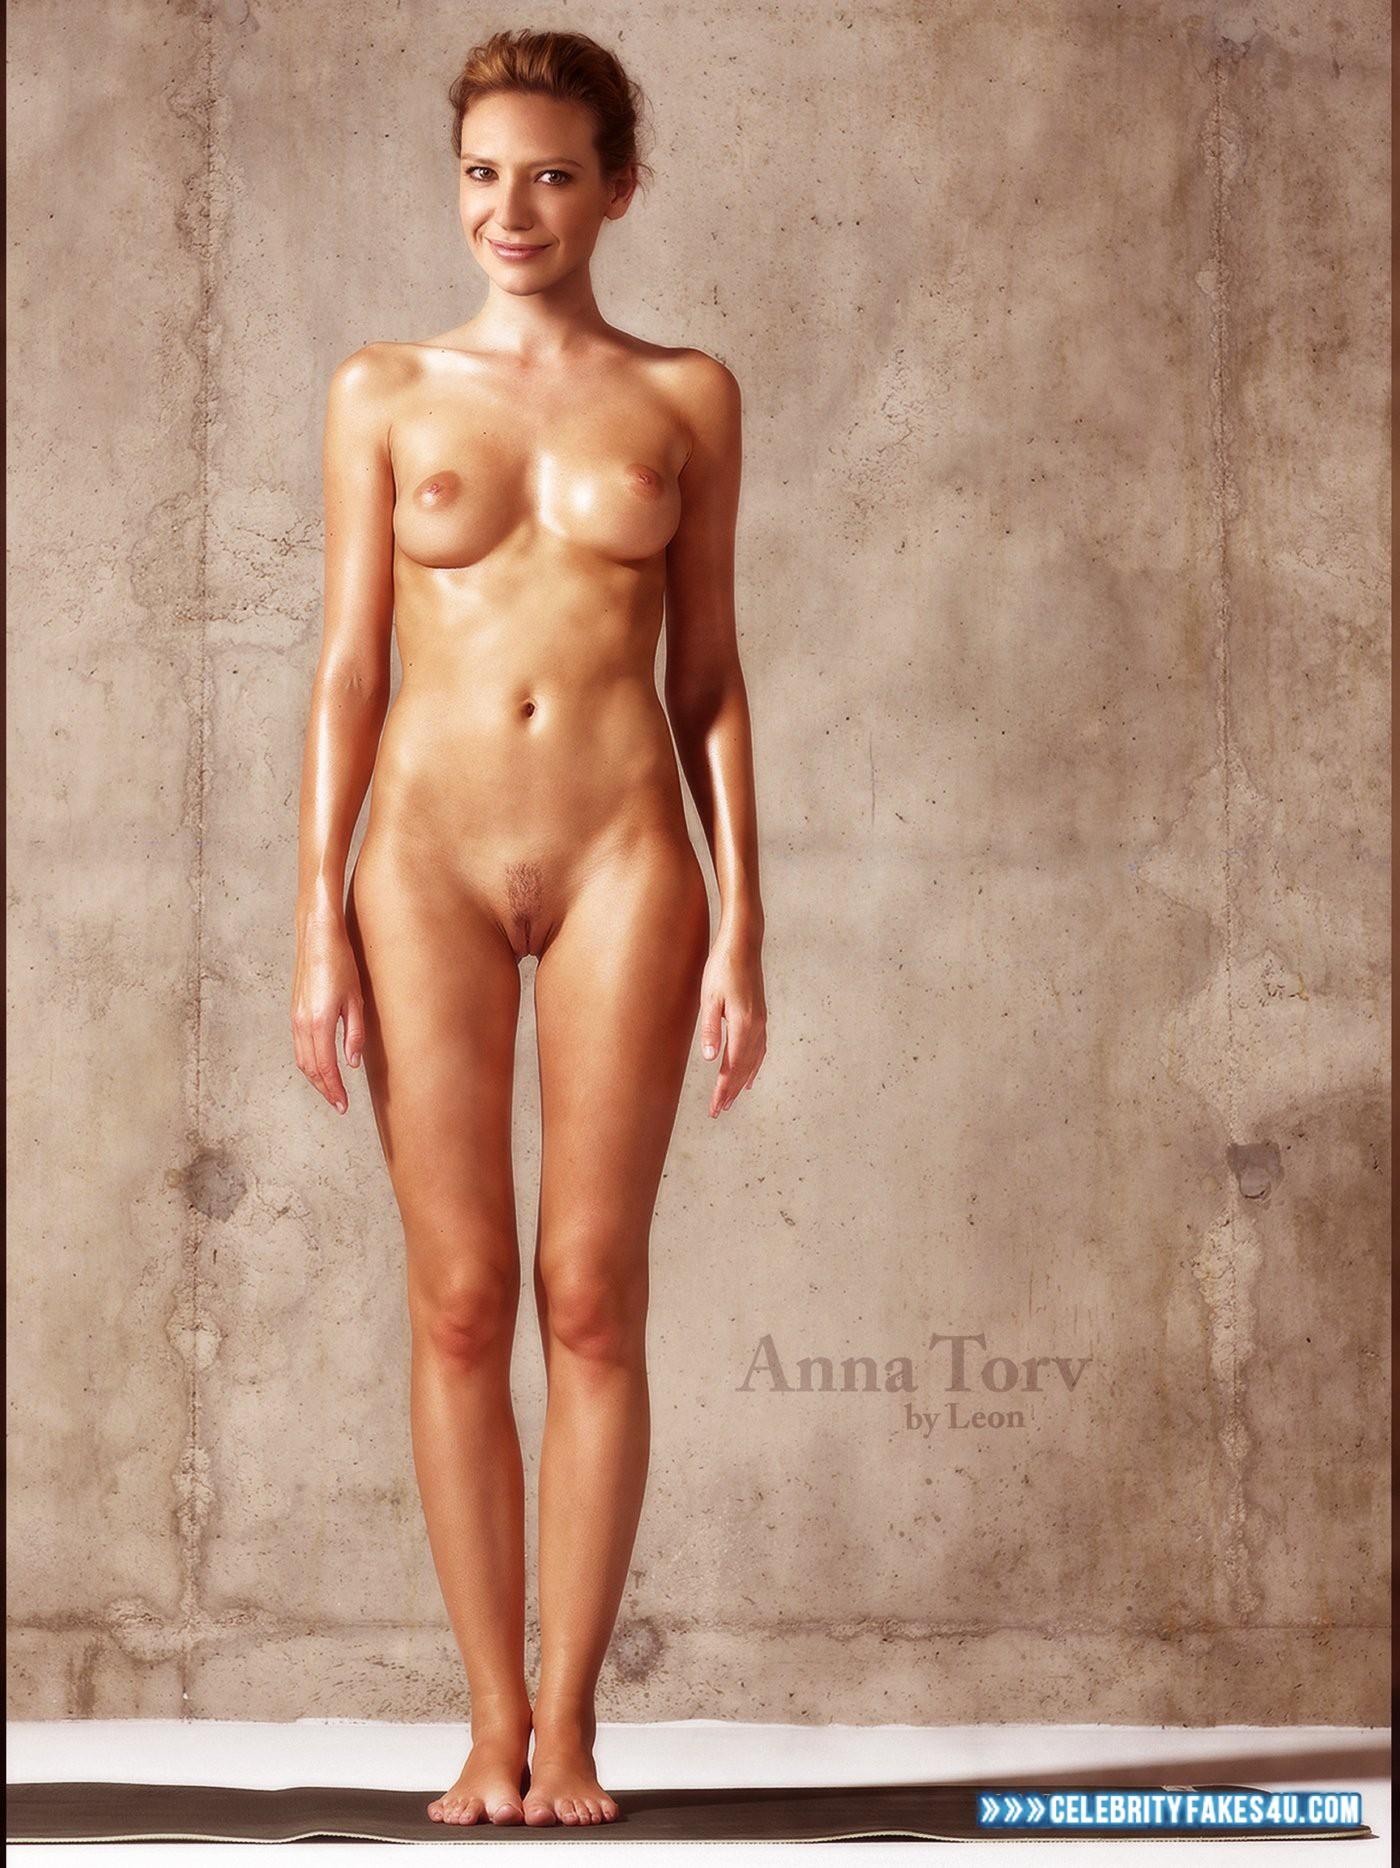 Anna torv nude fake